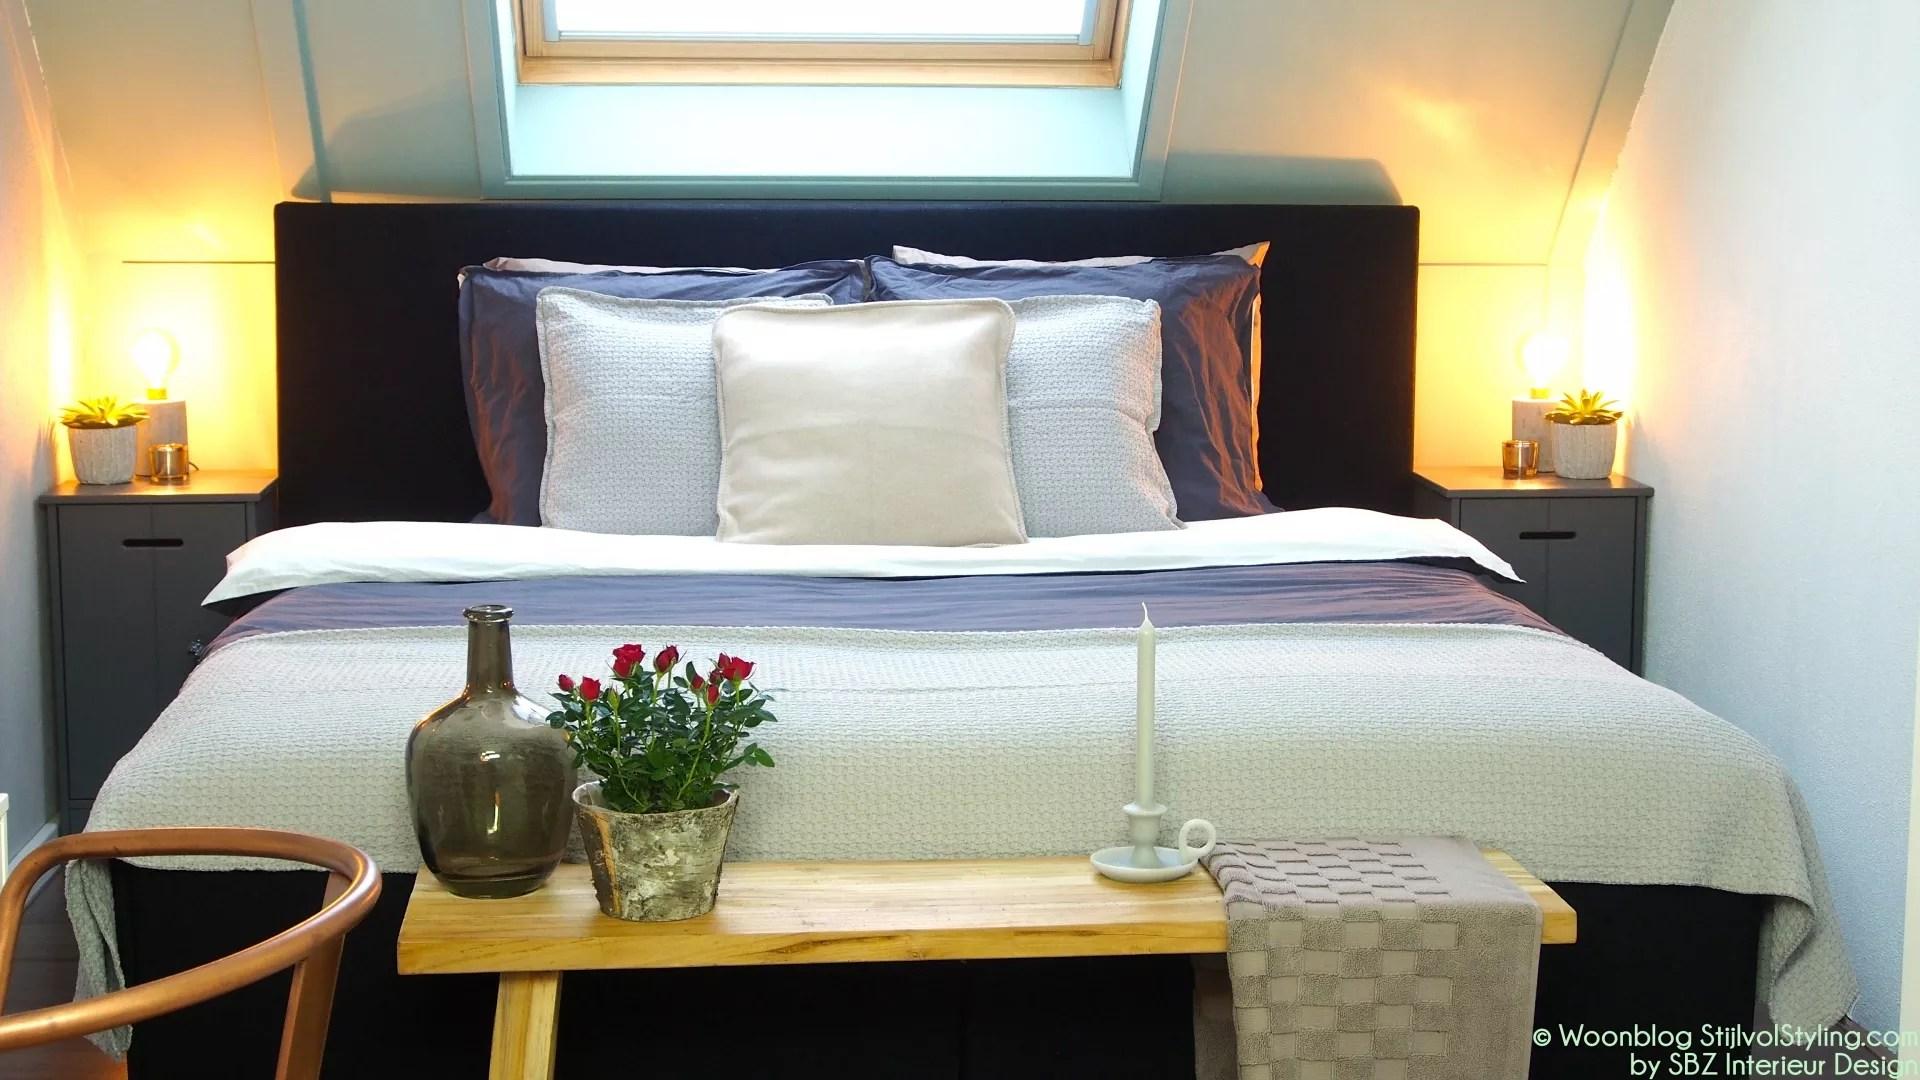 Interieur  Luxe hotel gevoel in eigen slaapkamer